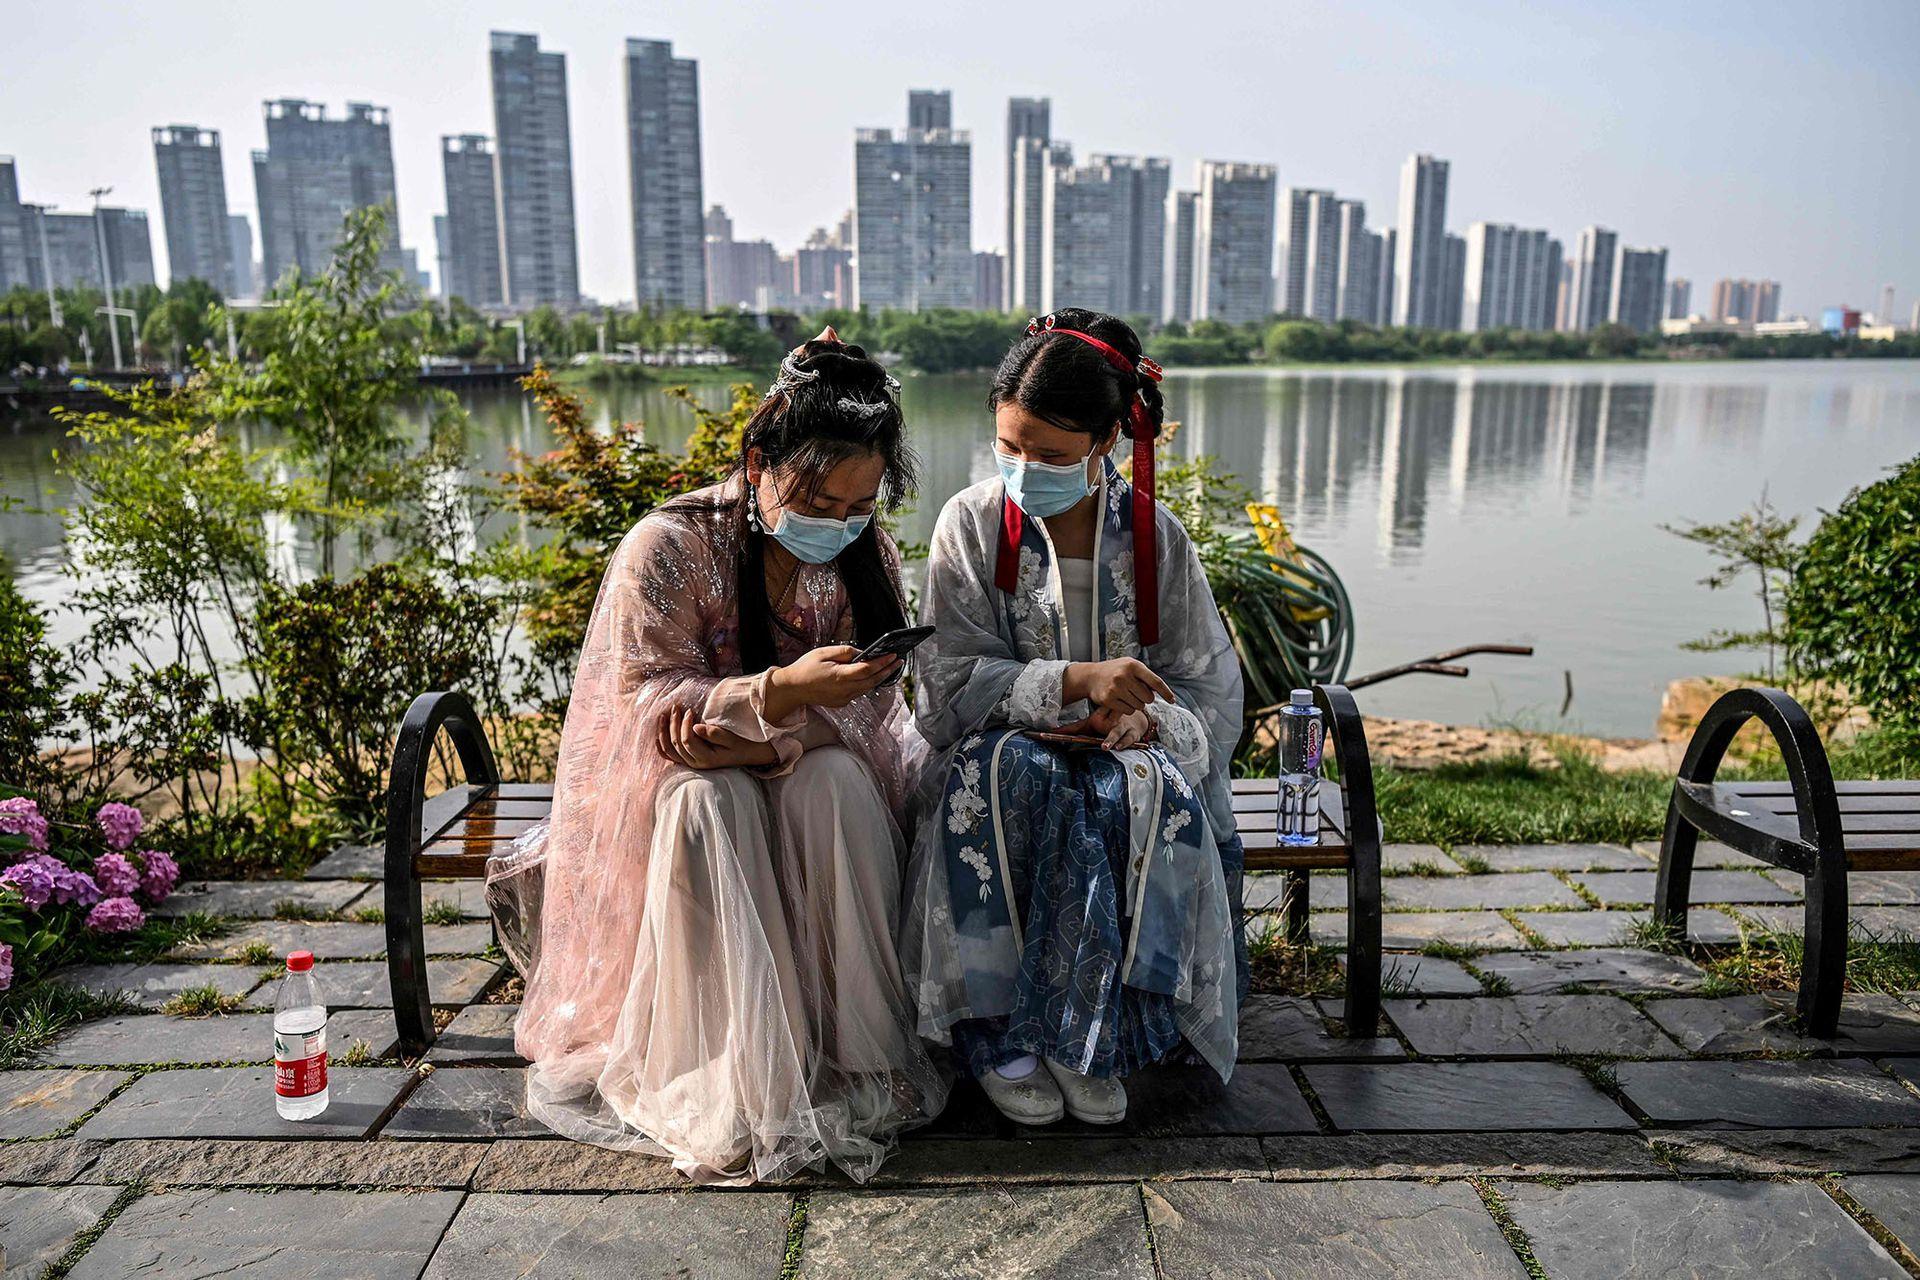 Zona cero pandémica. Dos mujeres conversan junto a un lago al este de Wuhan